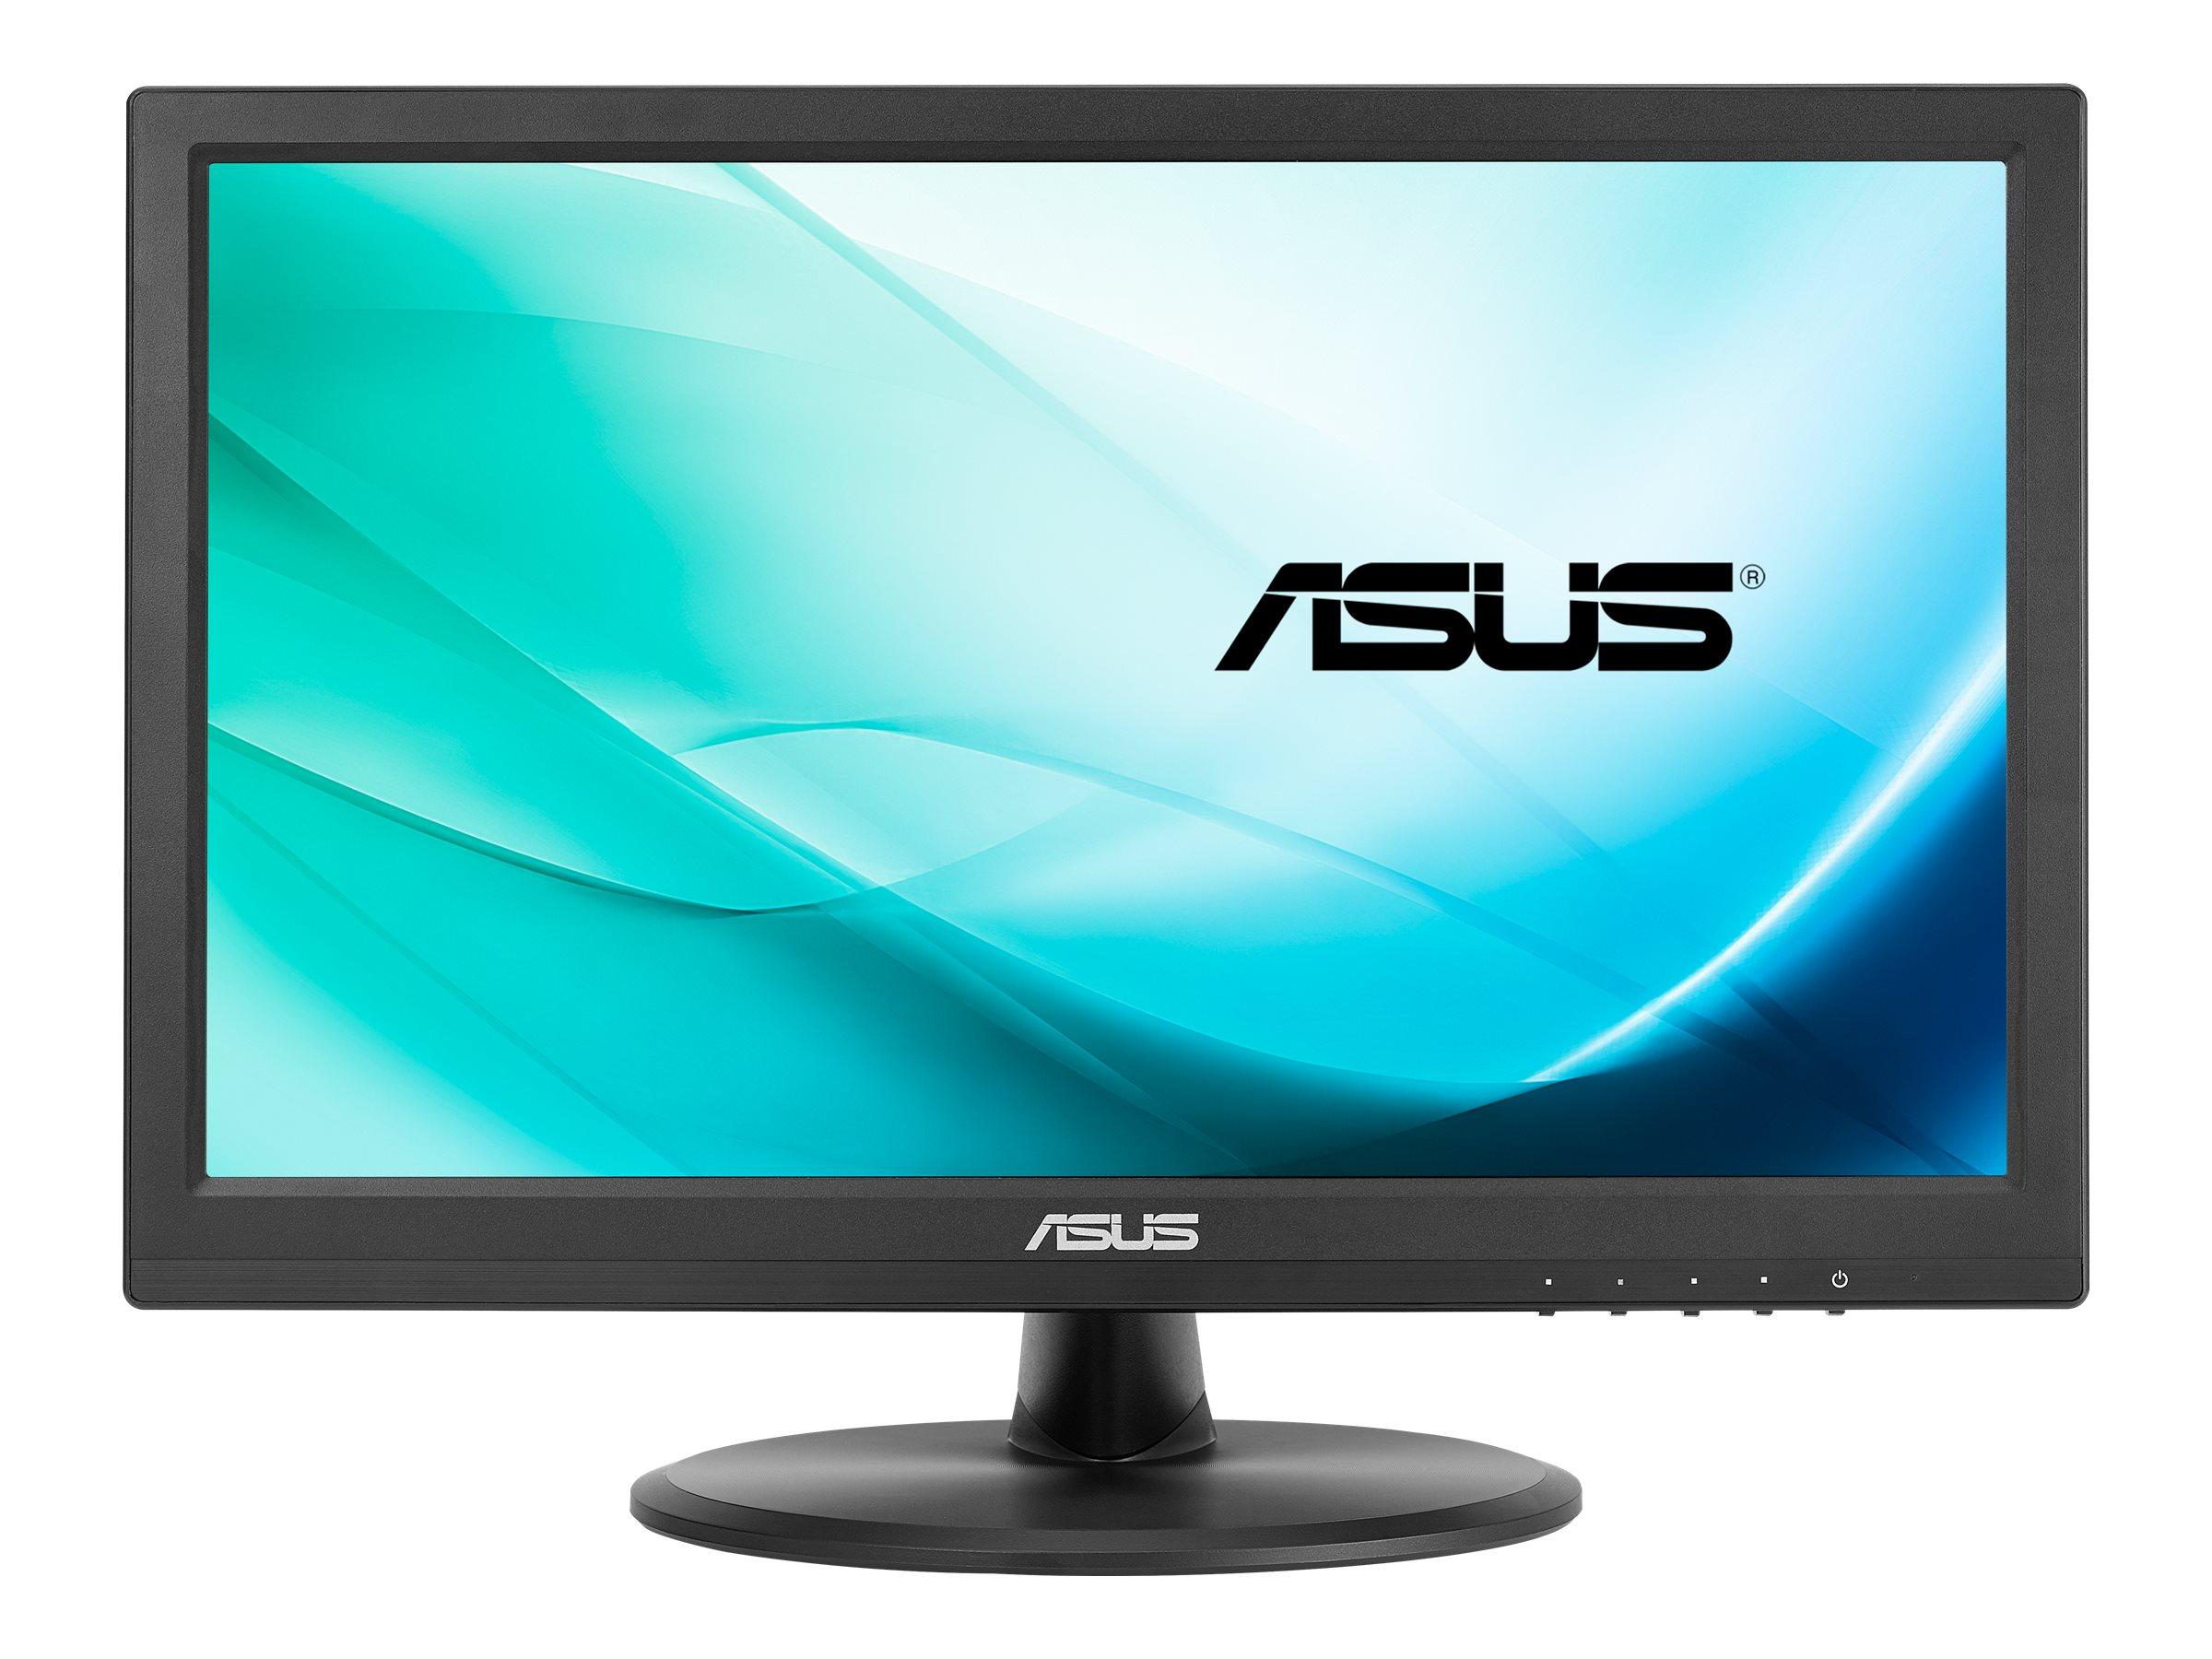 ASUS VT168N - LED-Monitor - 39.6 cm (15.6